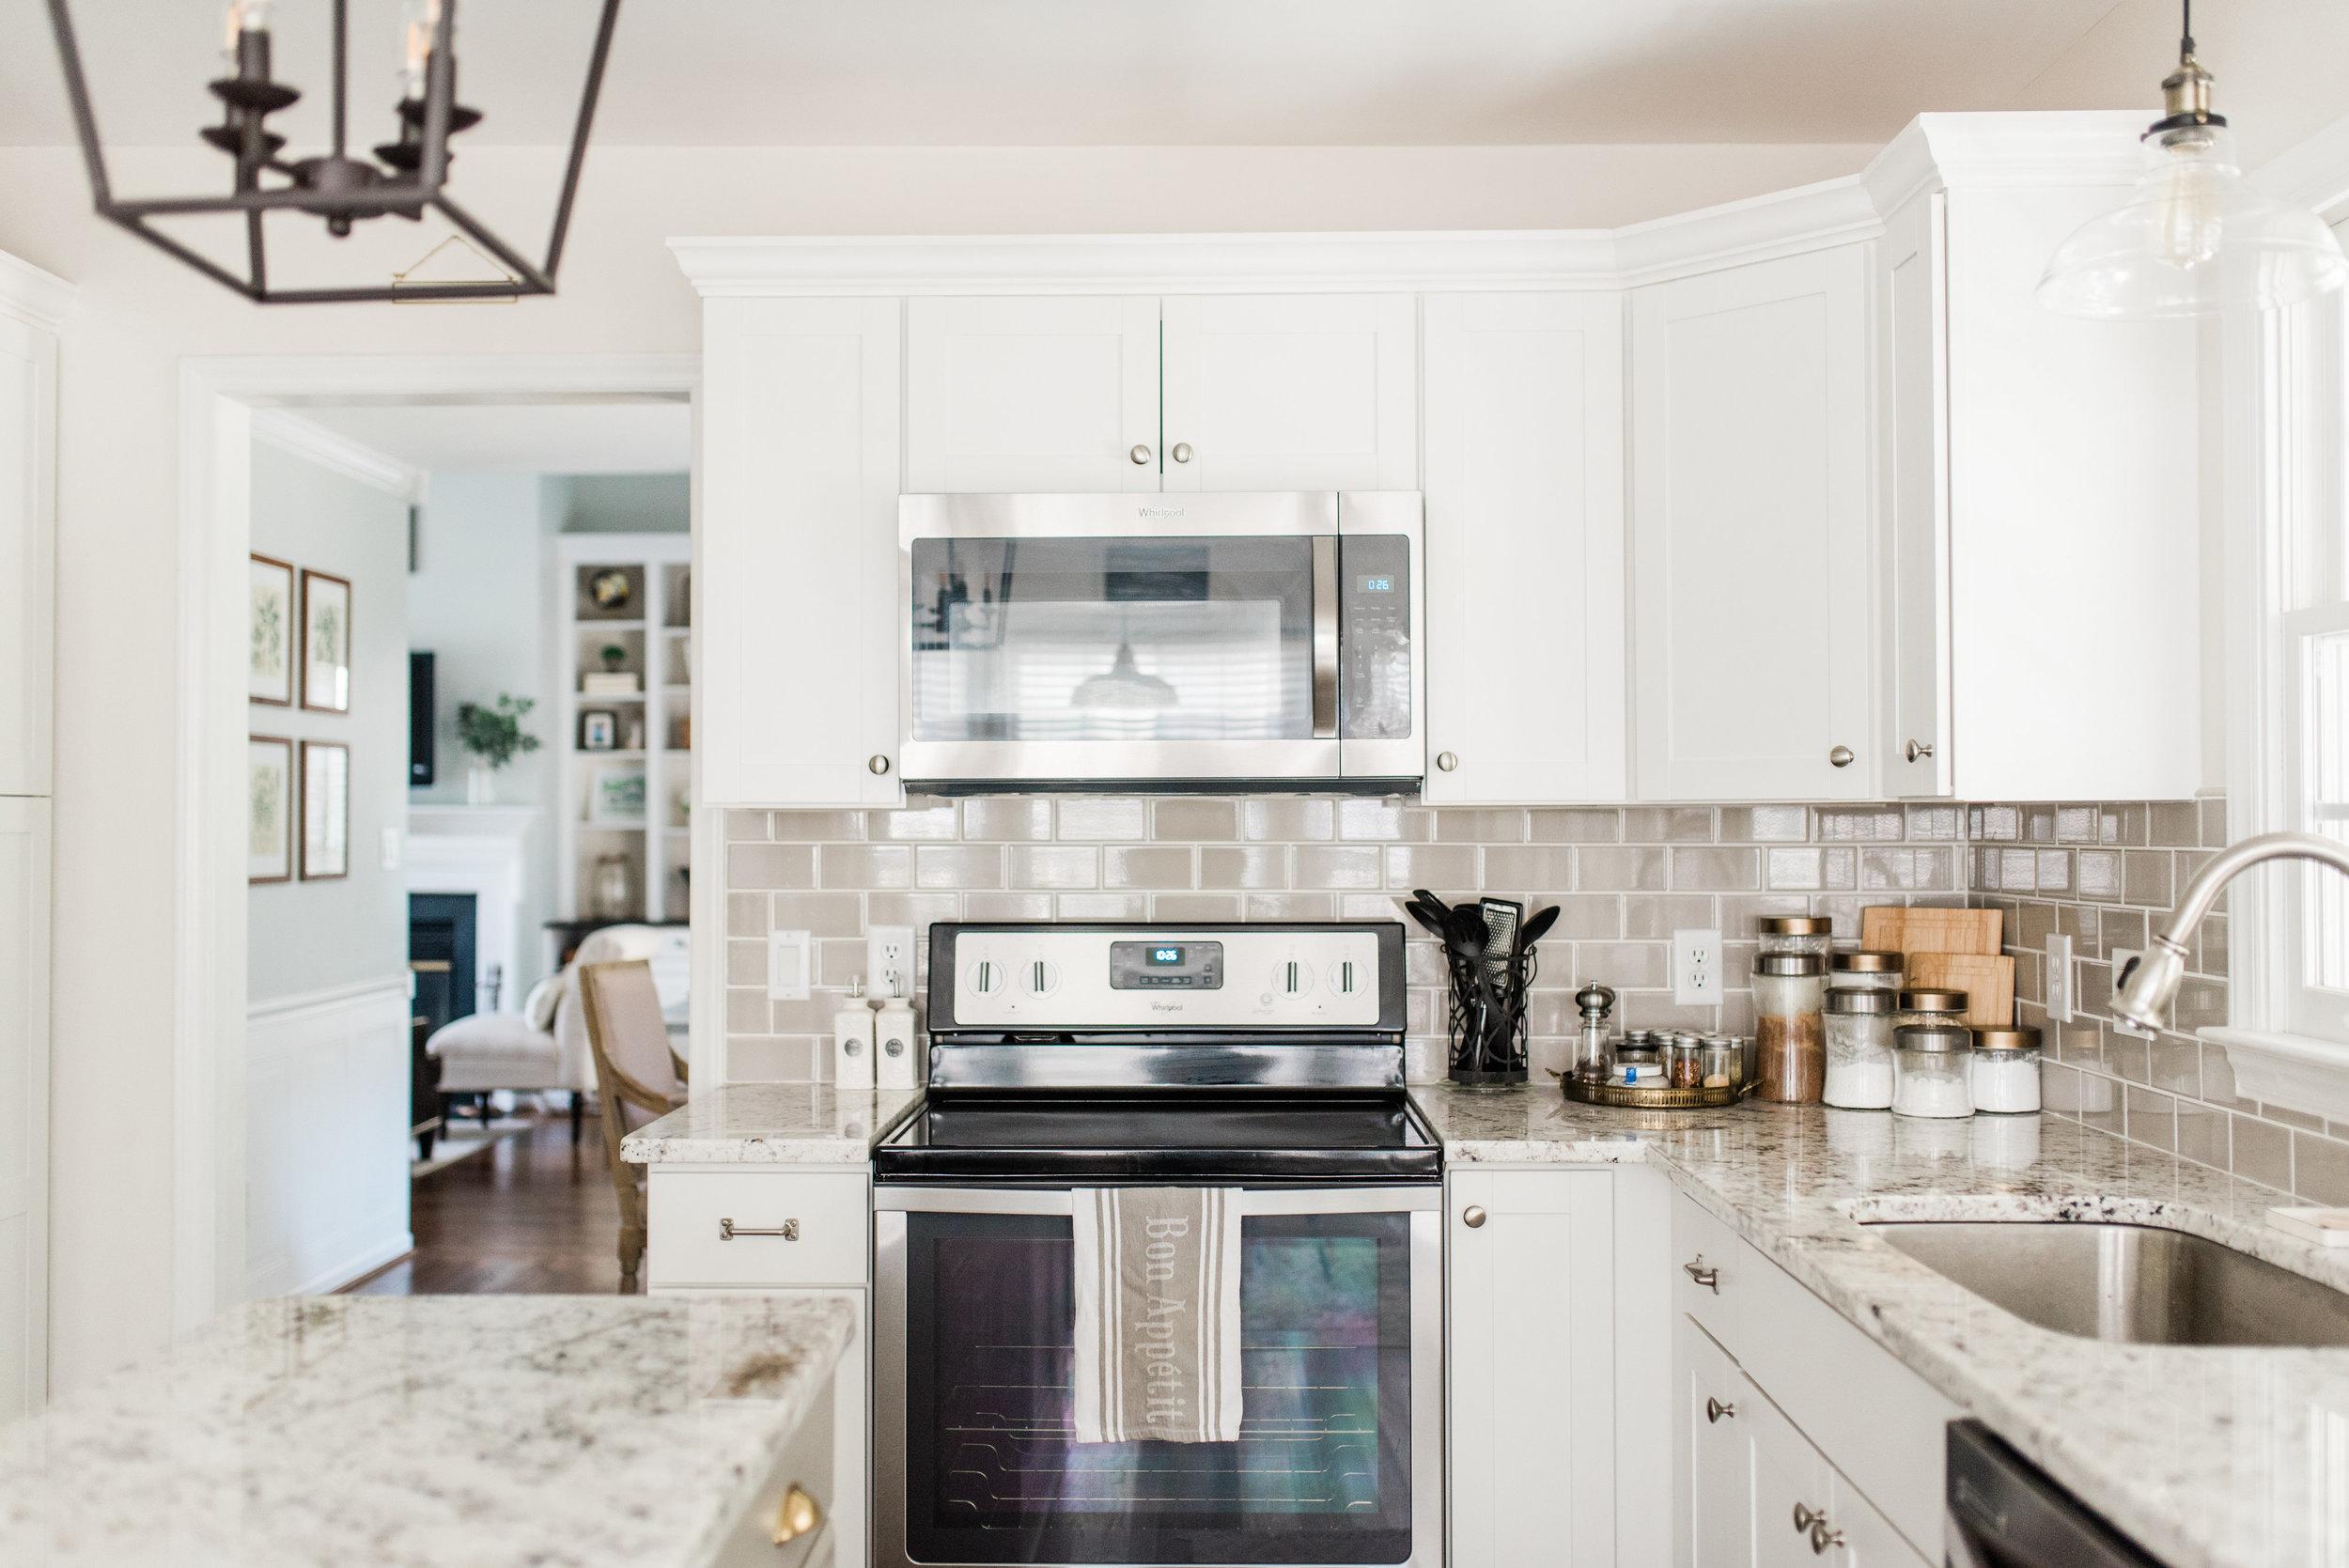 Arcadia Kitchen Cabinets Reviews | www.stkittsvilla.com